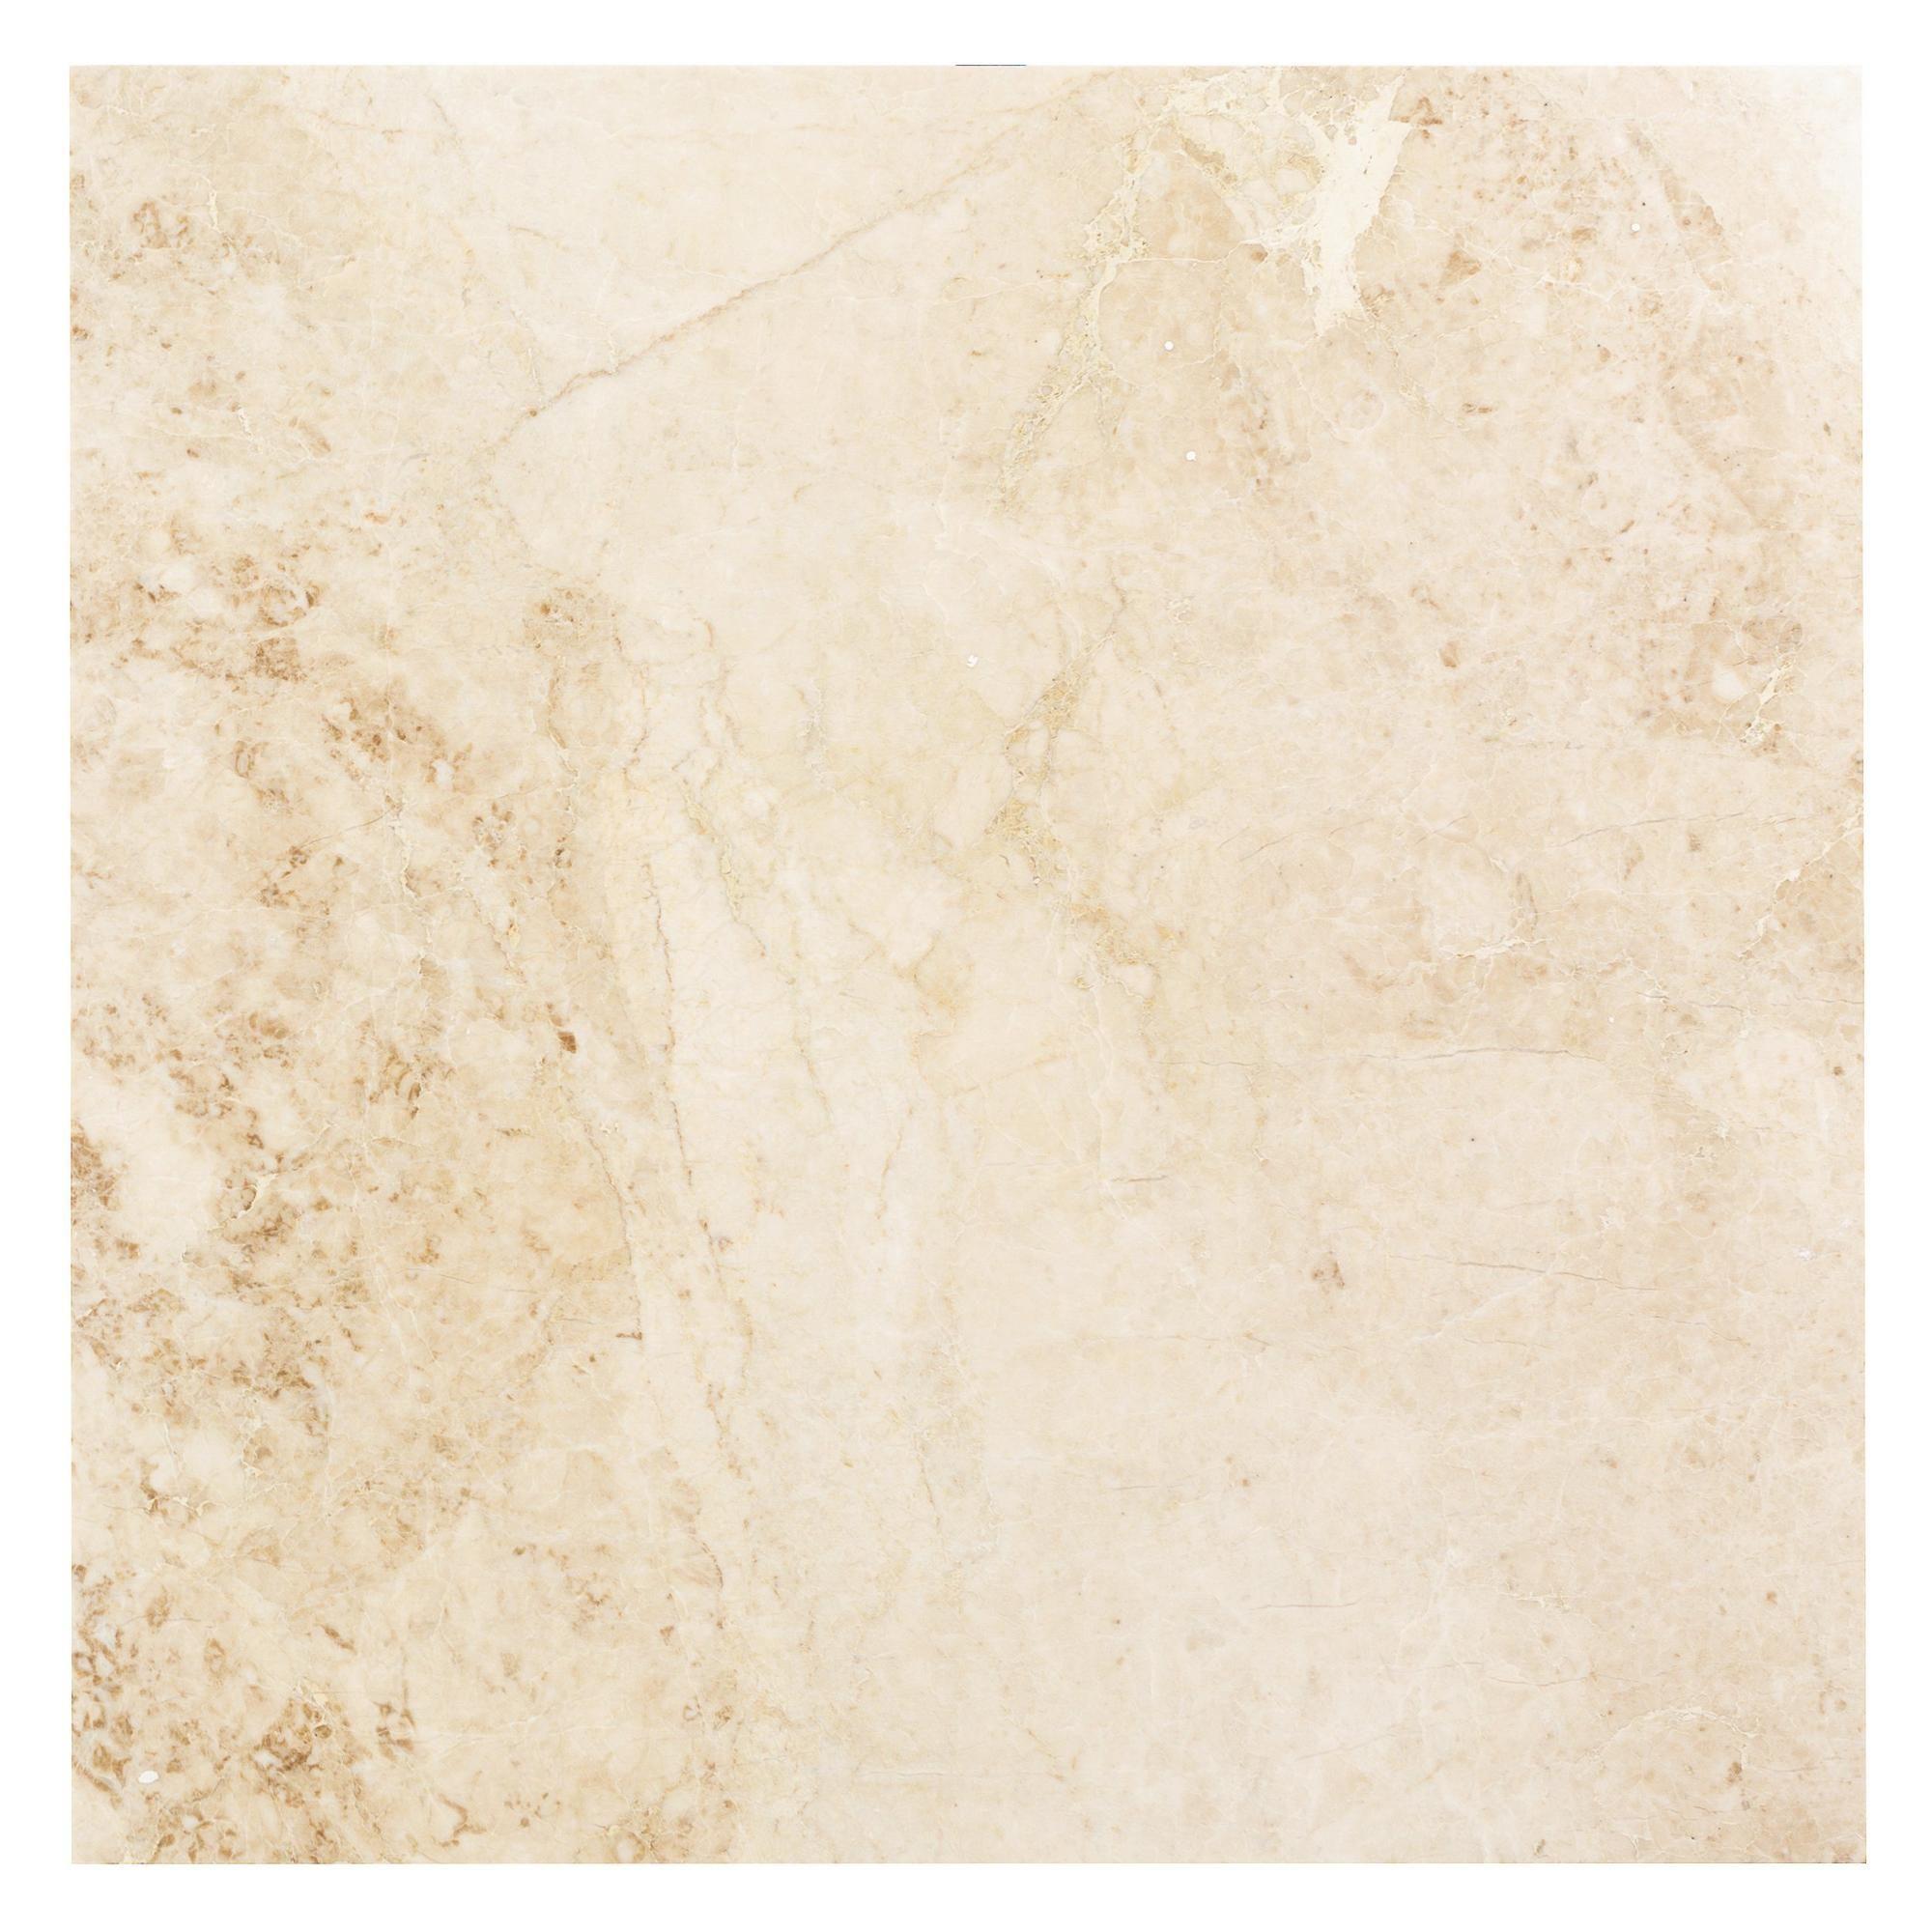 Fantasy Beige Marble Tile Floor Decor Beige Marble Tile Beige Marble Bathroom Beige Marble